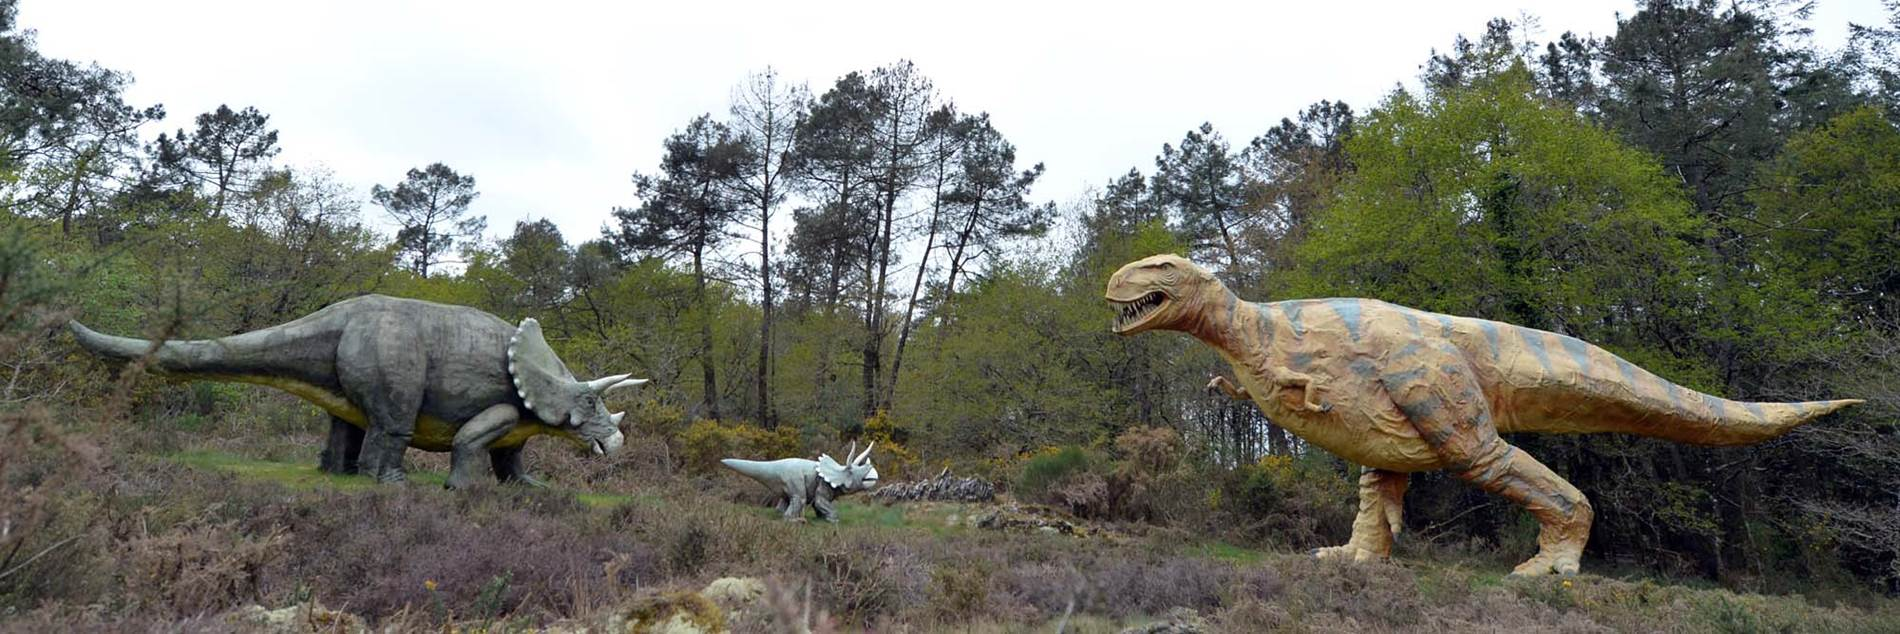 parc de prehistoire de bretagne - malansac - morbihan bretagne sud-01 © Michel RENAC